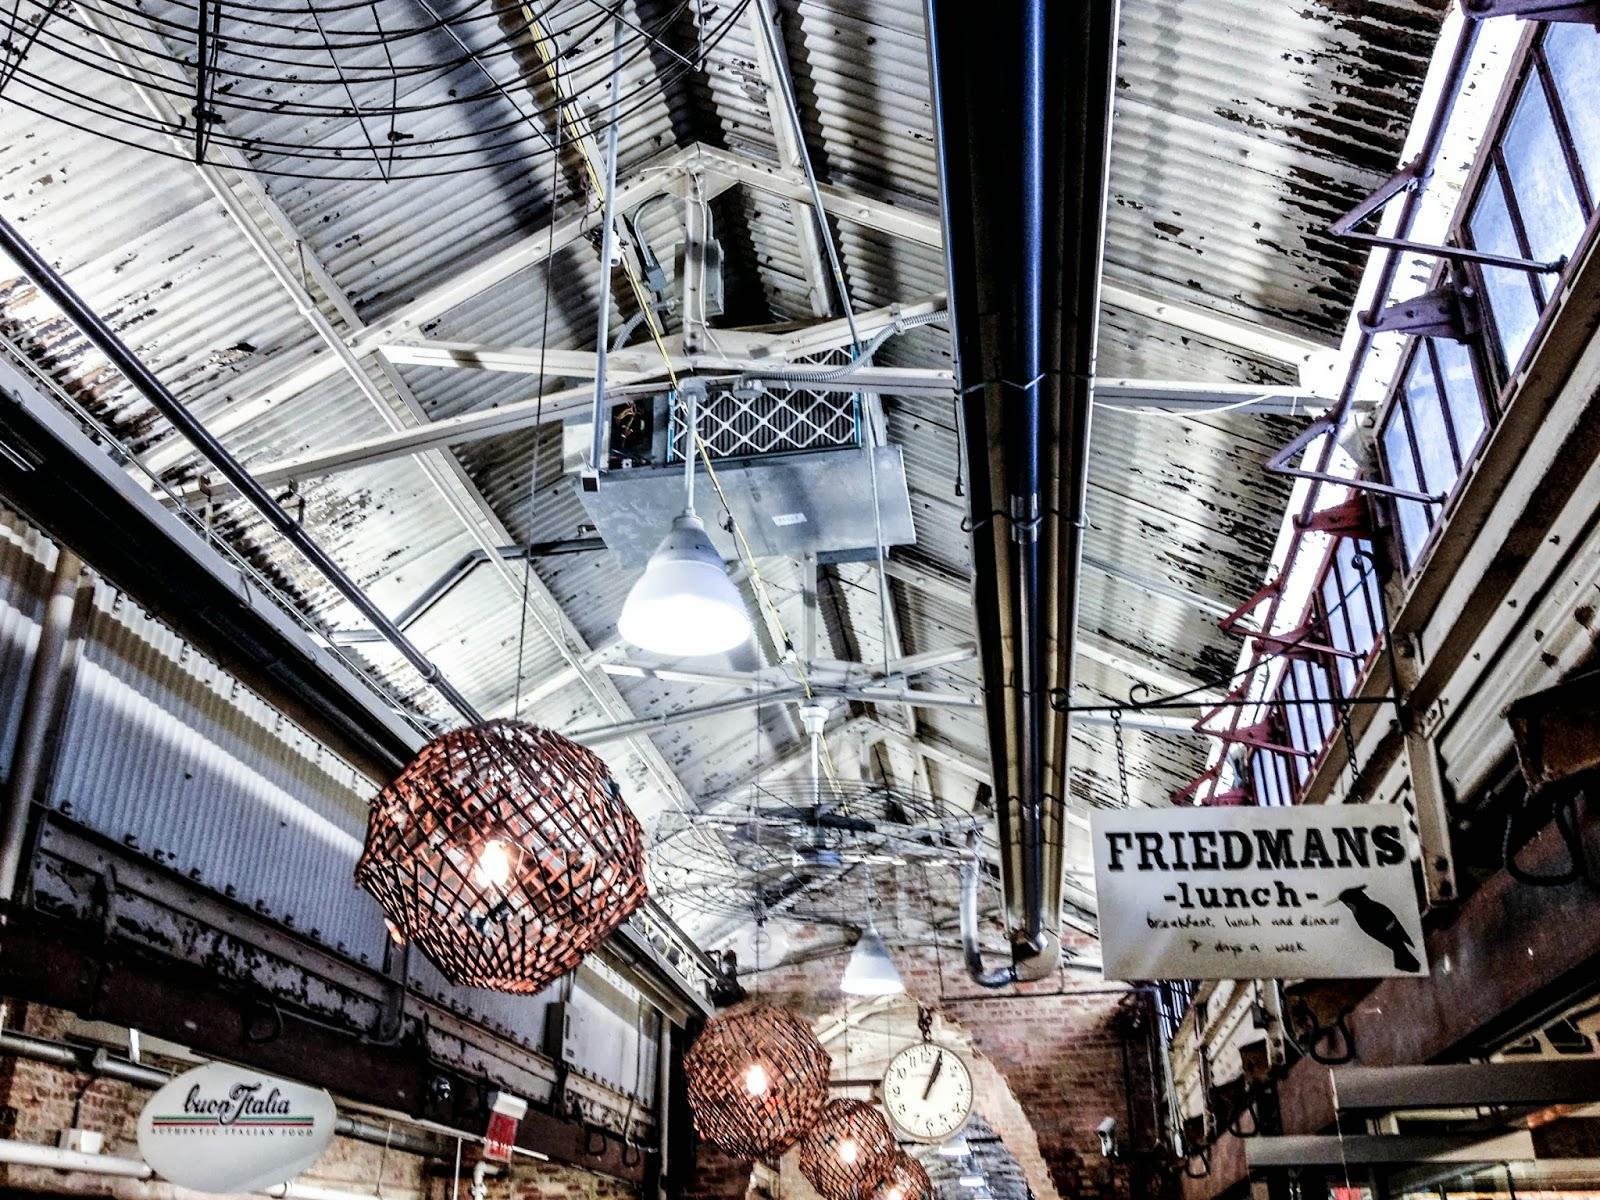 chelsea market place, new york city, chelsea market, chelsea new york, chelsea, meat packing district, new york sites